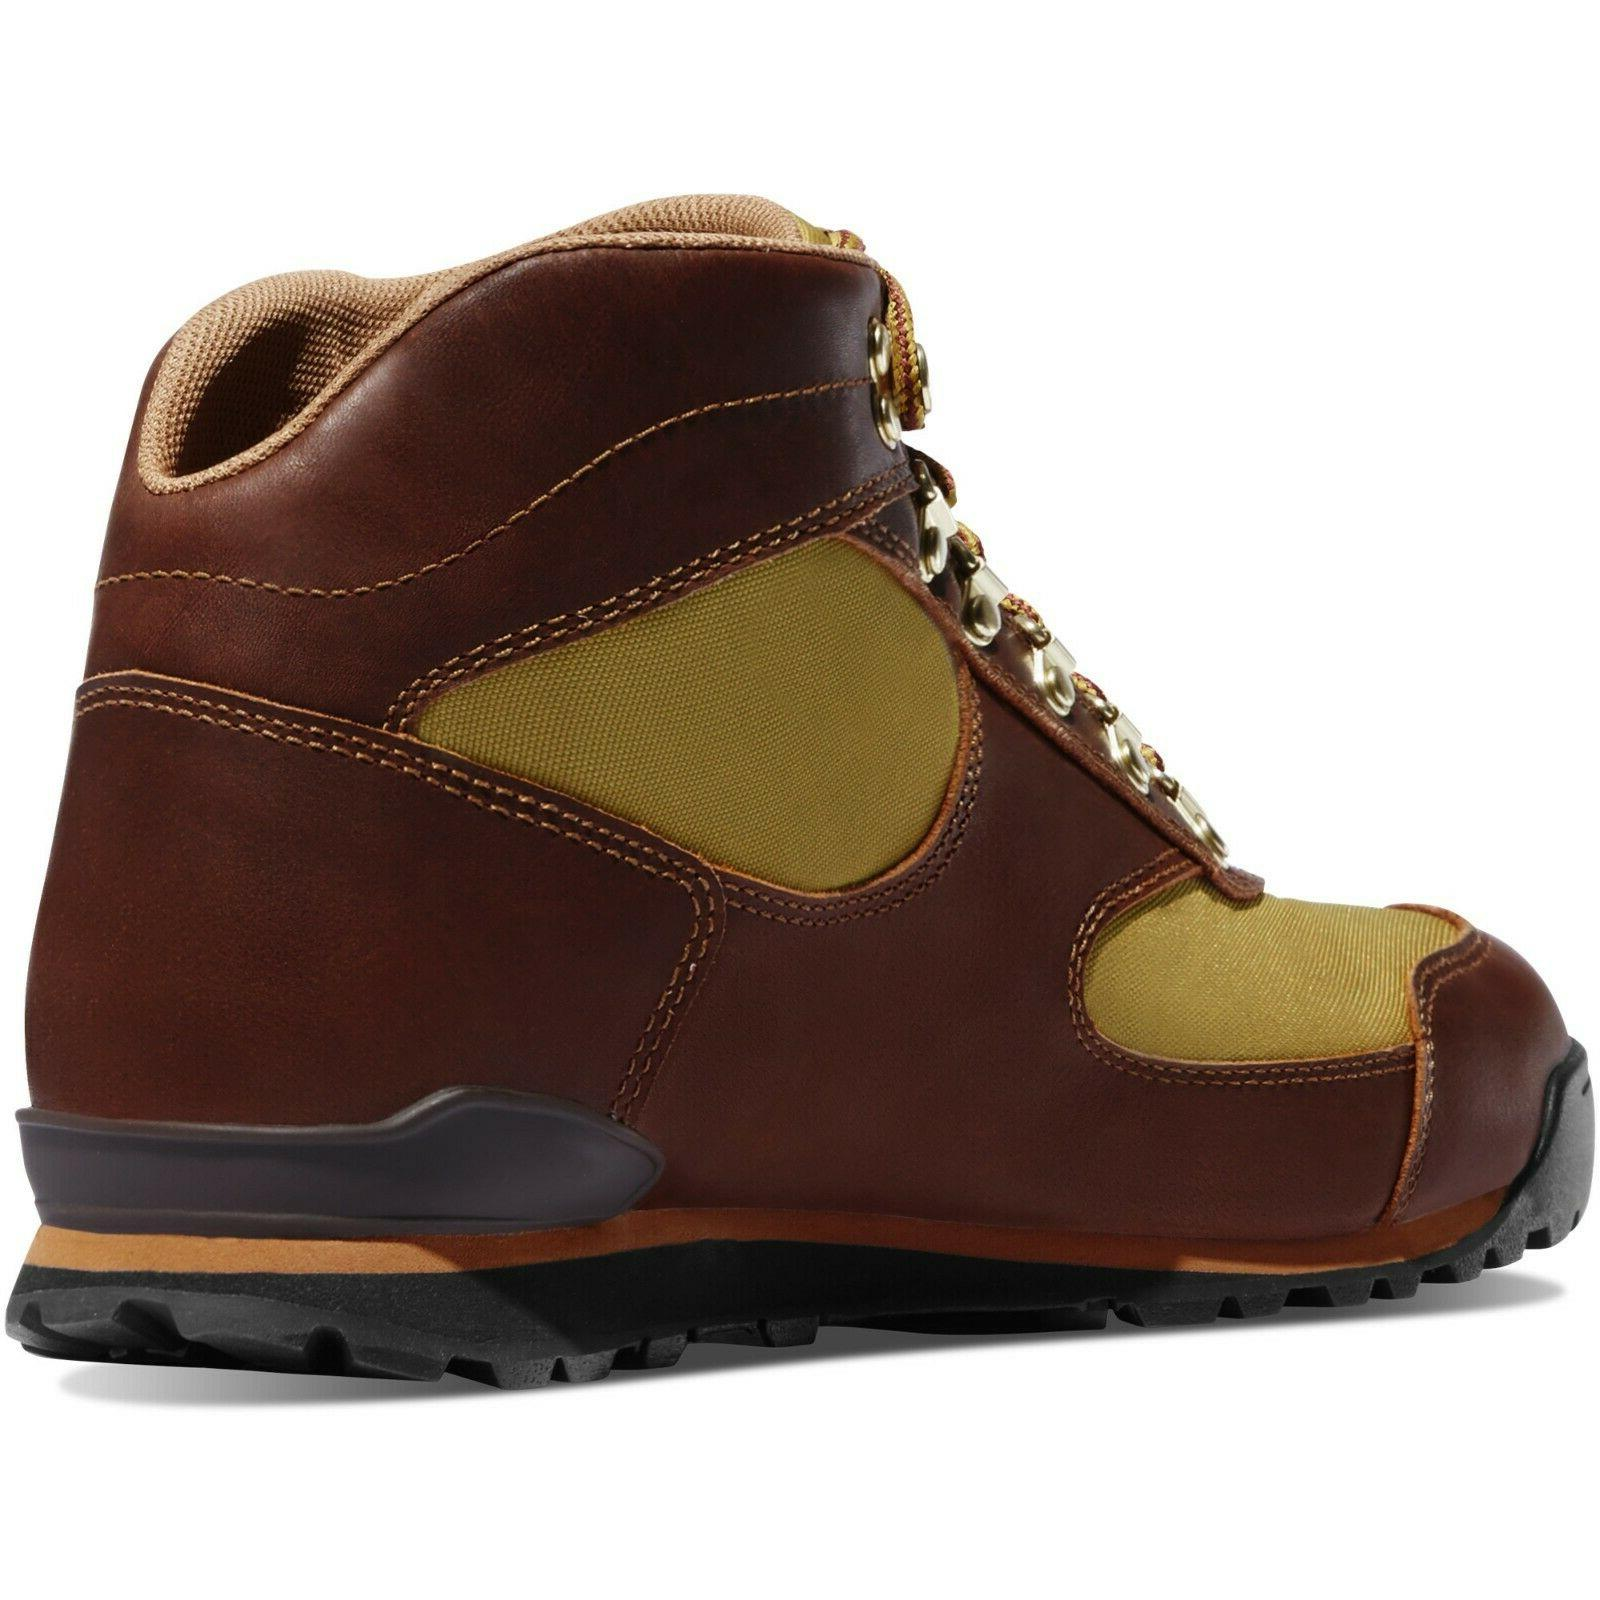 Danner Men's Everyday Waterproof Hiking Boots Brown/Khaki 37351